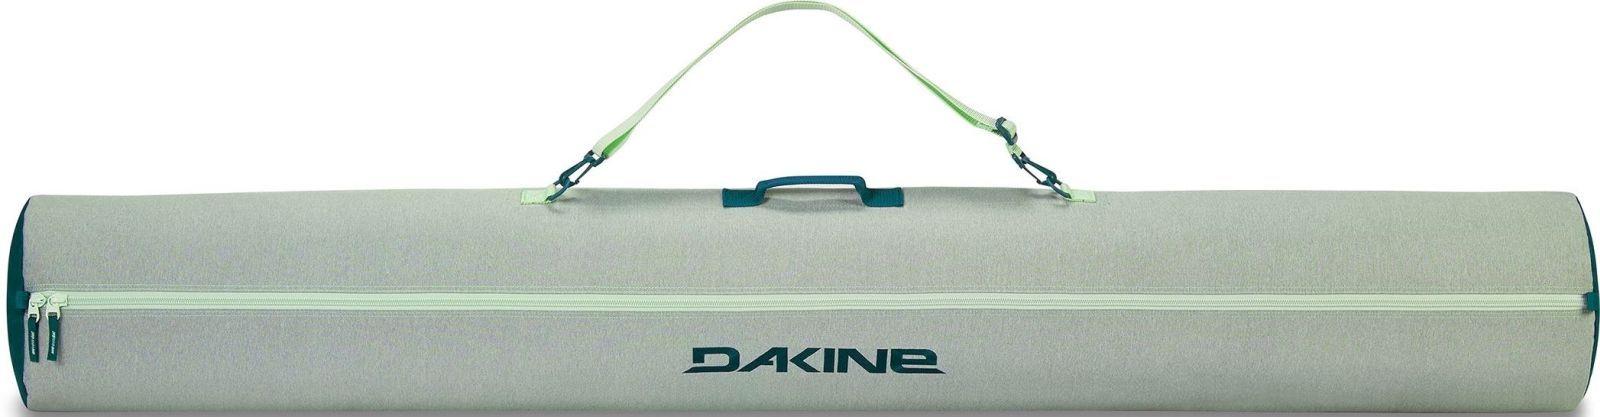 Dakine Ski Sleeve - green lily 175 cm